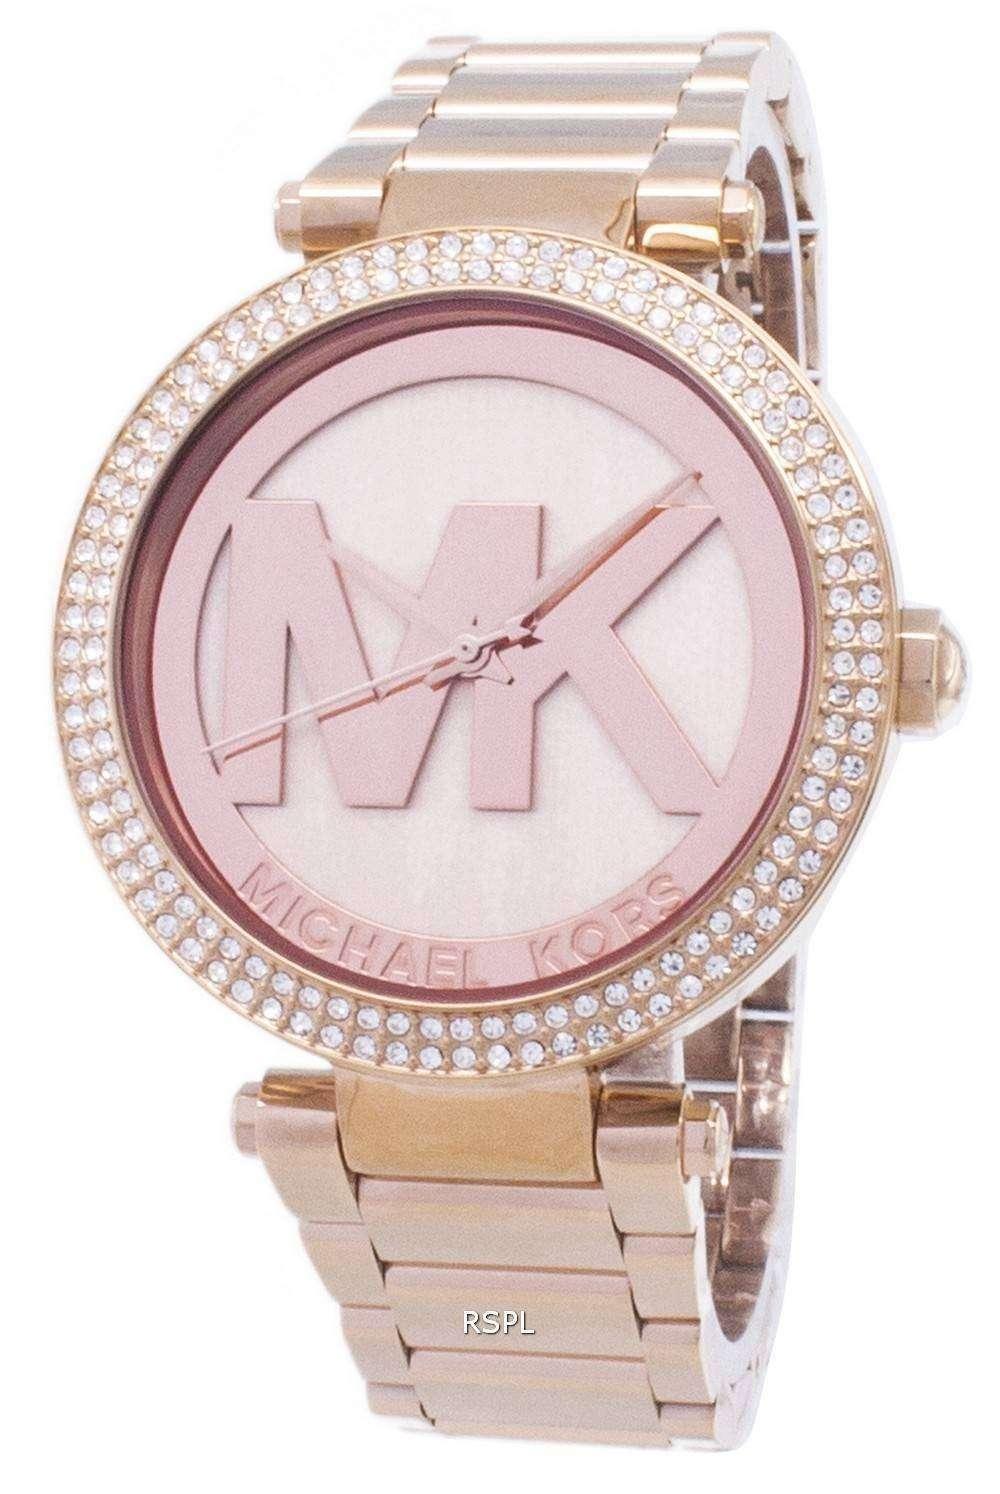 9eed440c7ec0 Michael Kors Parker Crystals MK5865 Womens Watch